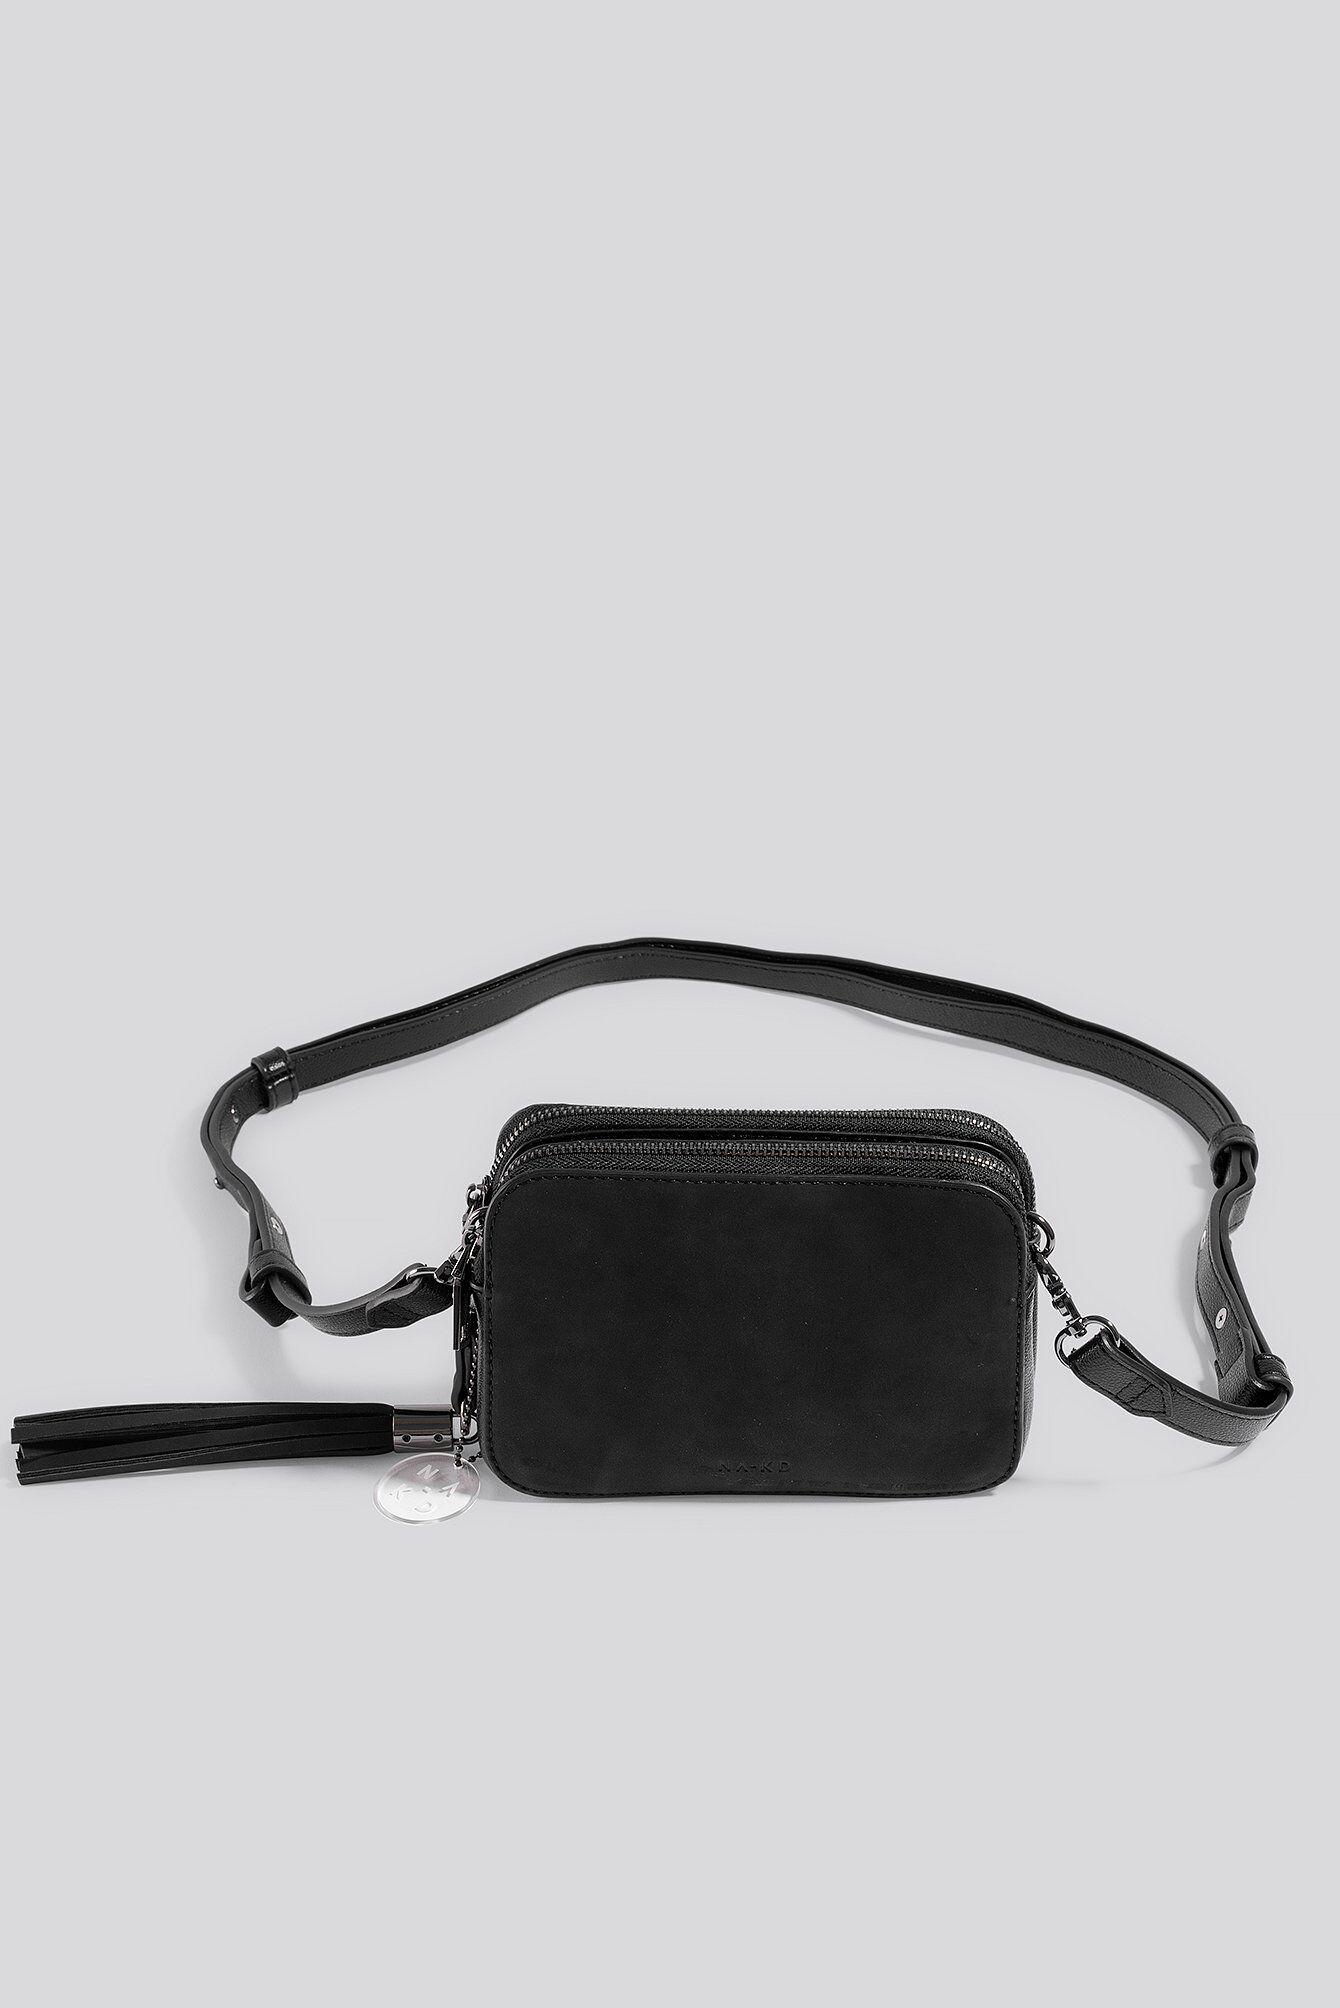 NA-KD Accessories Heritage Crossbody Bag - Black